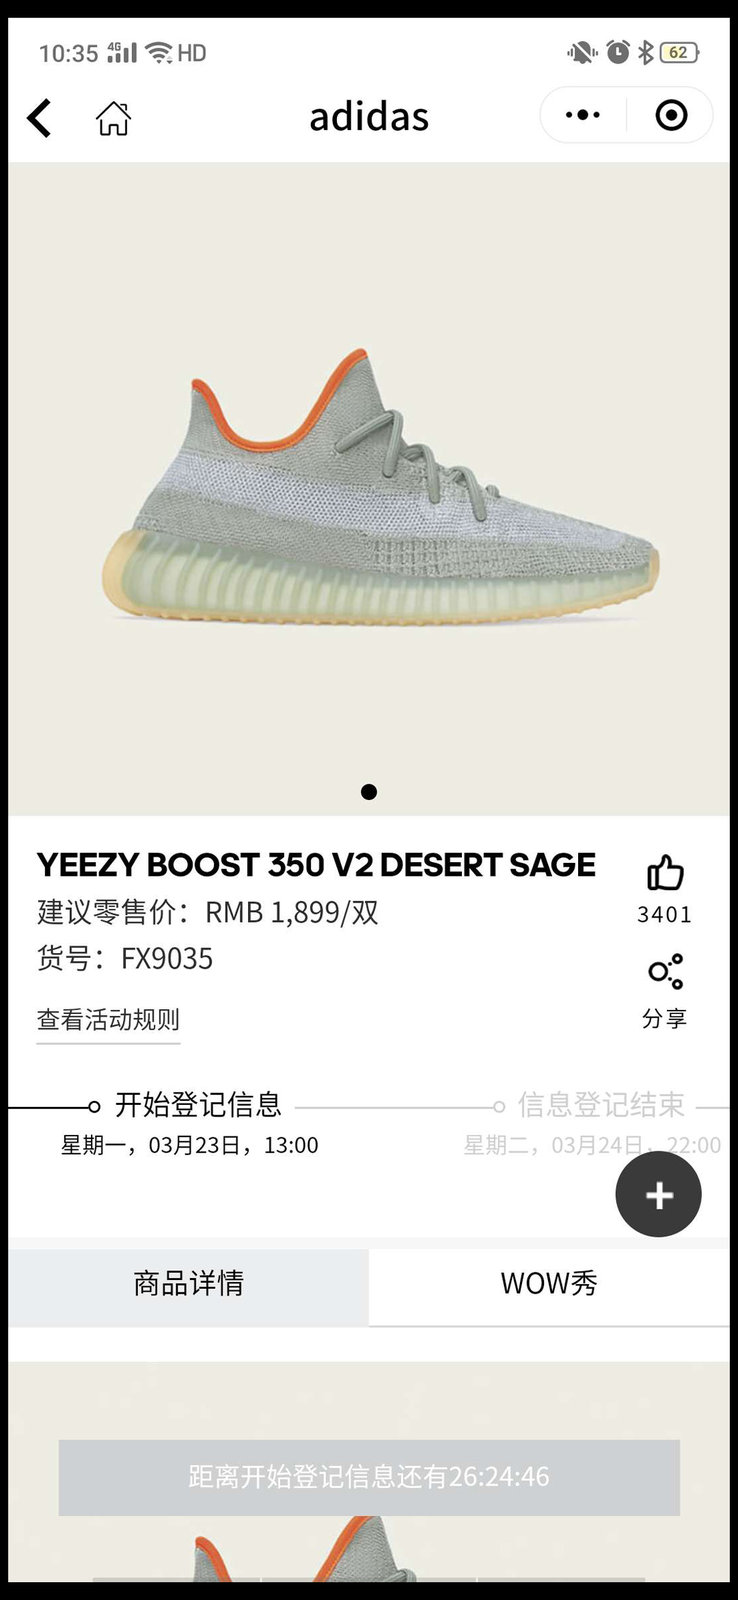 "Yeezy 350 V2,adidas,发售,FX9035  153 座城市发售!Yeezy 350 V2 ""Desert Sage"" 明天开启登记!"